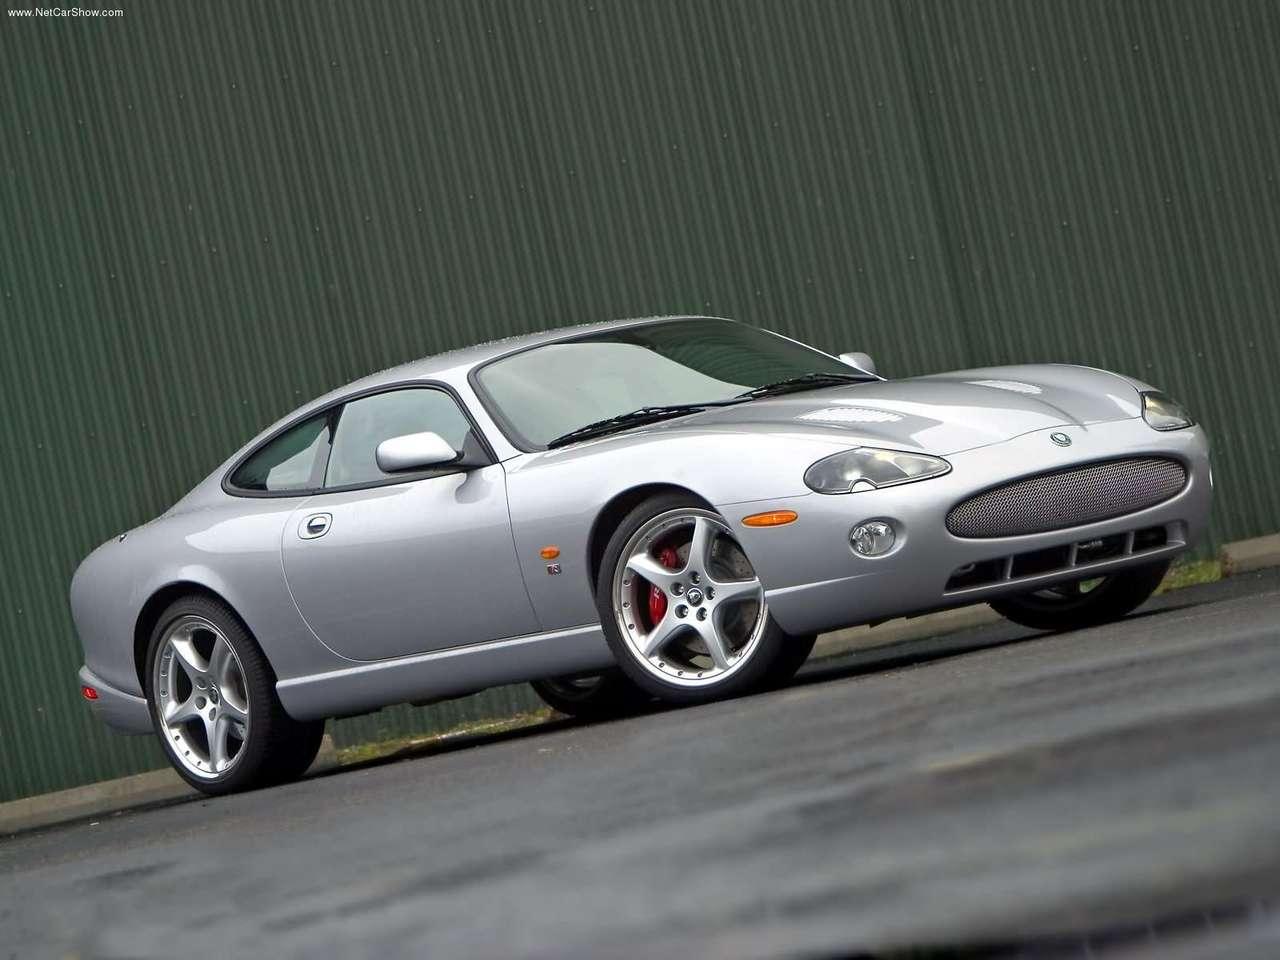 http://4.bp.blogspot.com/-J2Xvdpf03Ns/TZMgTQNVudI/AAAAAAAACLk/2fowU8np-4Y/s1600/Jaguar-XKR_Coupe_2005_1280x960_wallpaper_02.jpg